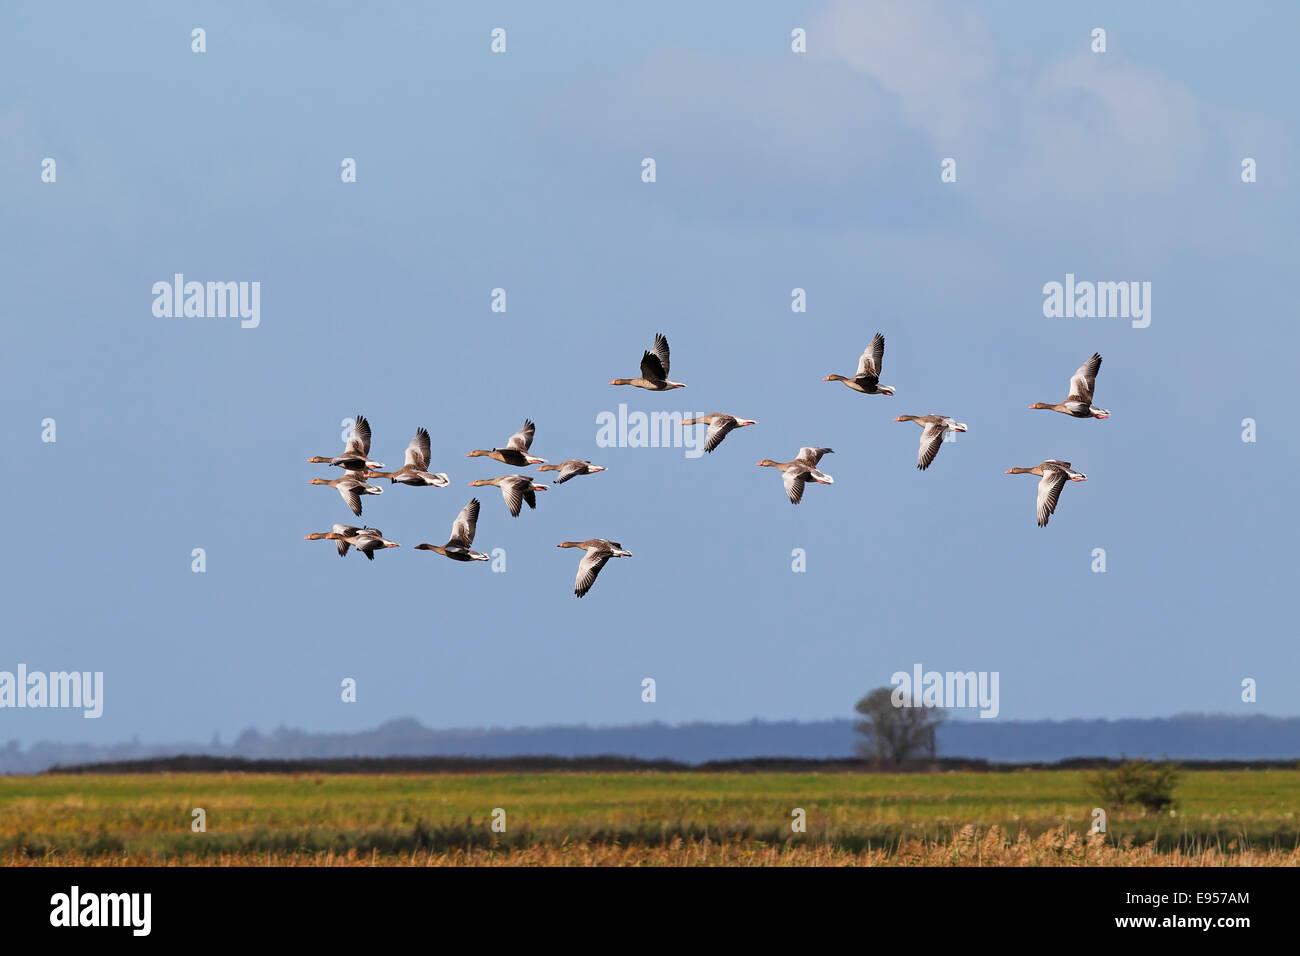 Flying greylag geese (Anser anser), bird migration, fall migration, Mecklenburg-Western Pomerania, Germany - Stock Image